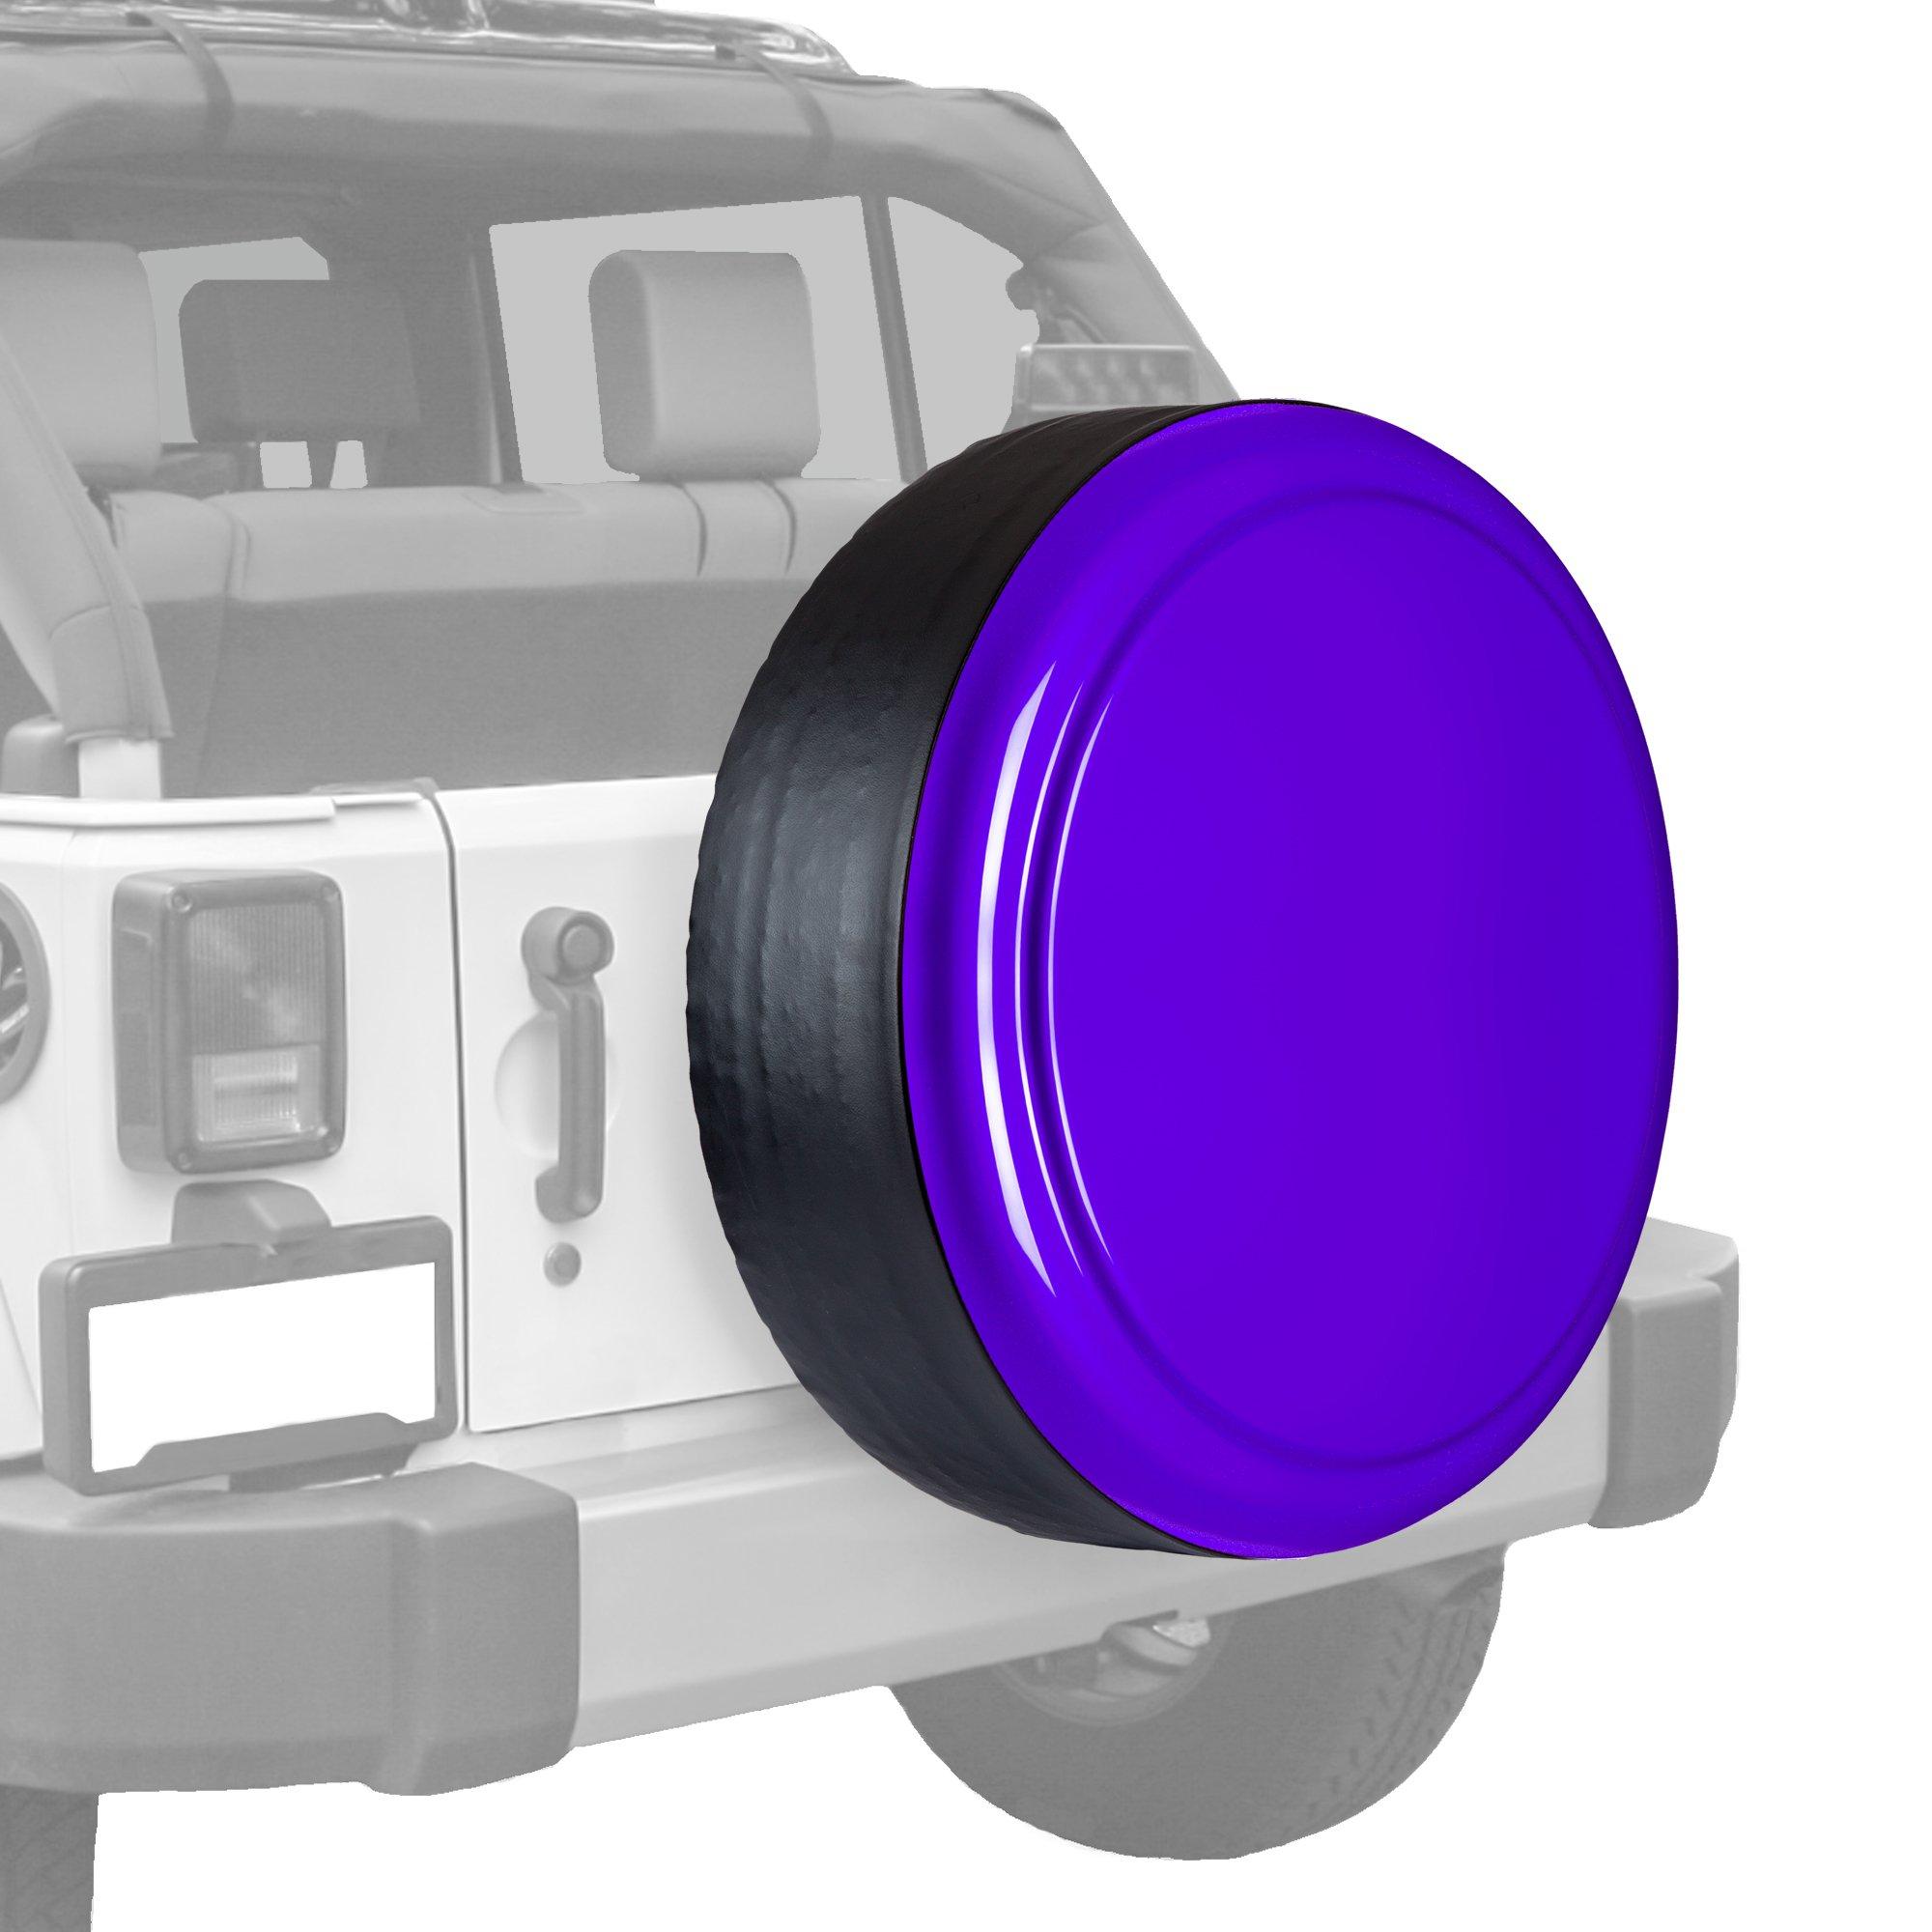 Boomerang Jeep Wrangler (JK) - 35'' Color Matched Rigid Tire Cover (Plastic Face & Vinyl Band) - Xtreme Purple